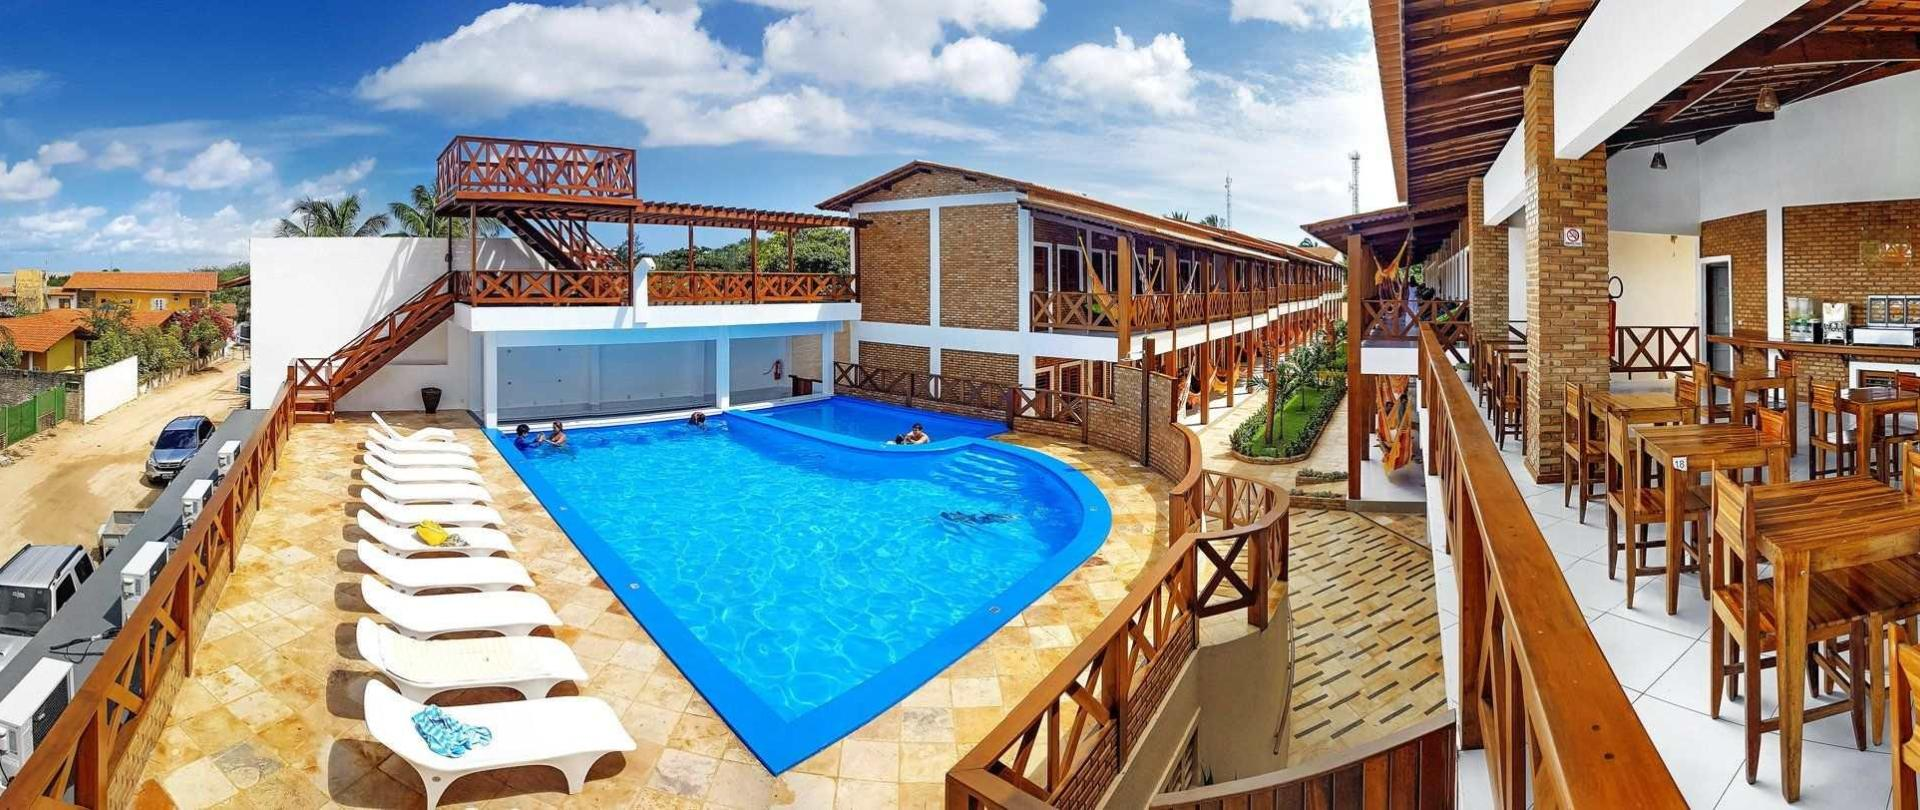 hotel_jeri_2016_panoramica_28.jpg